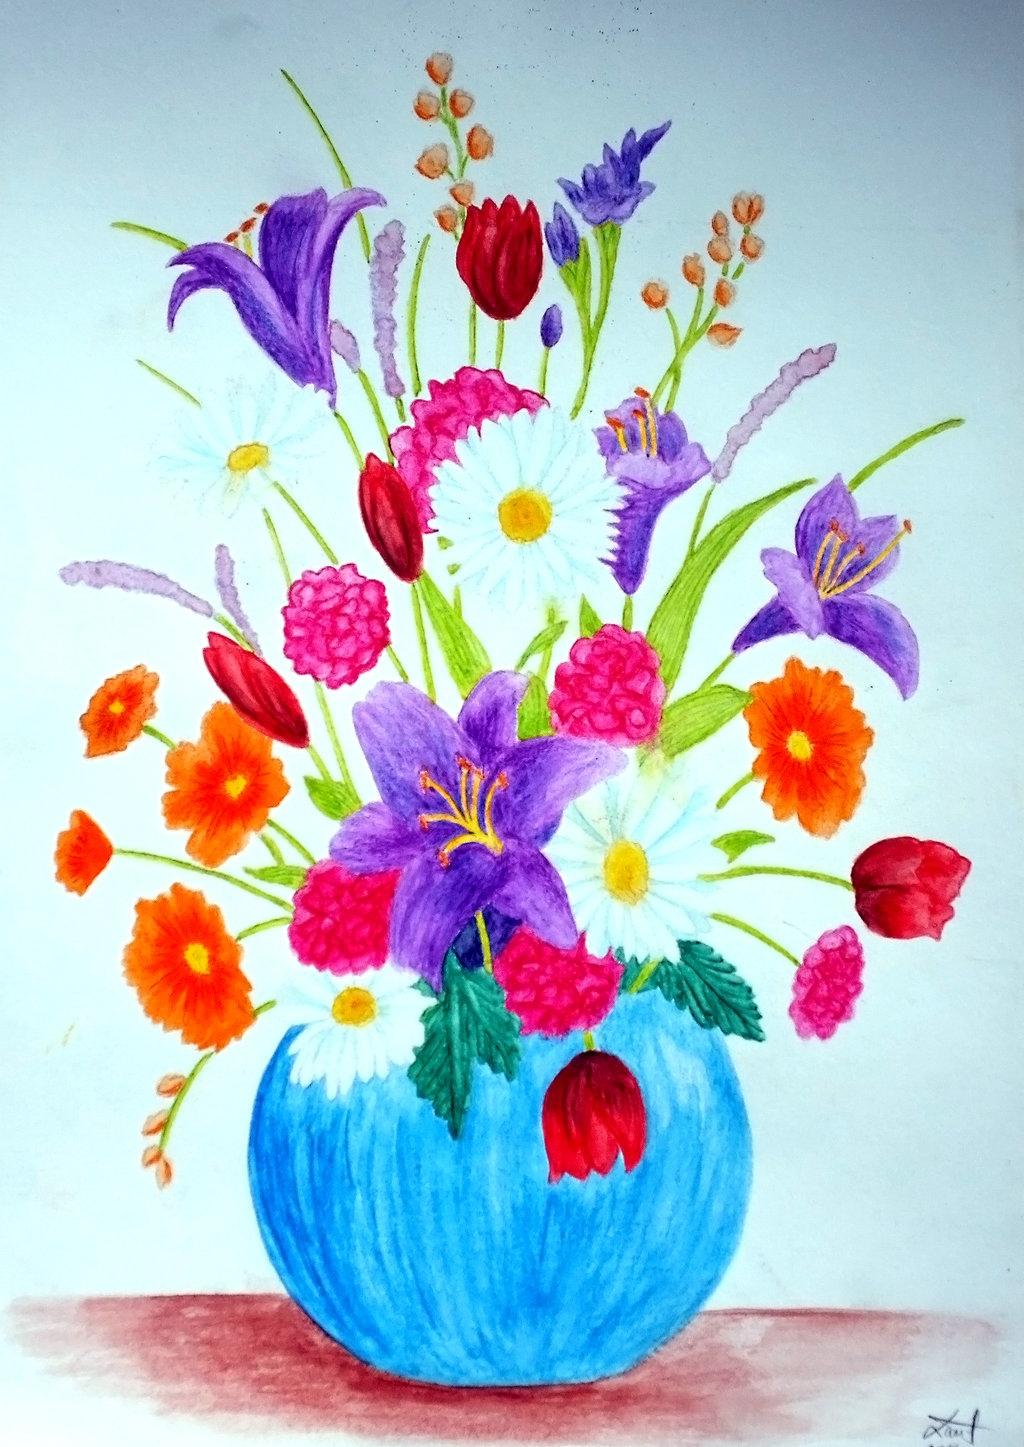 1024x1447 Flower Vase Pot Painting Luxury Flowers In A Vase Watercolor